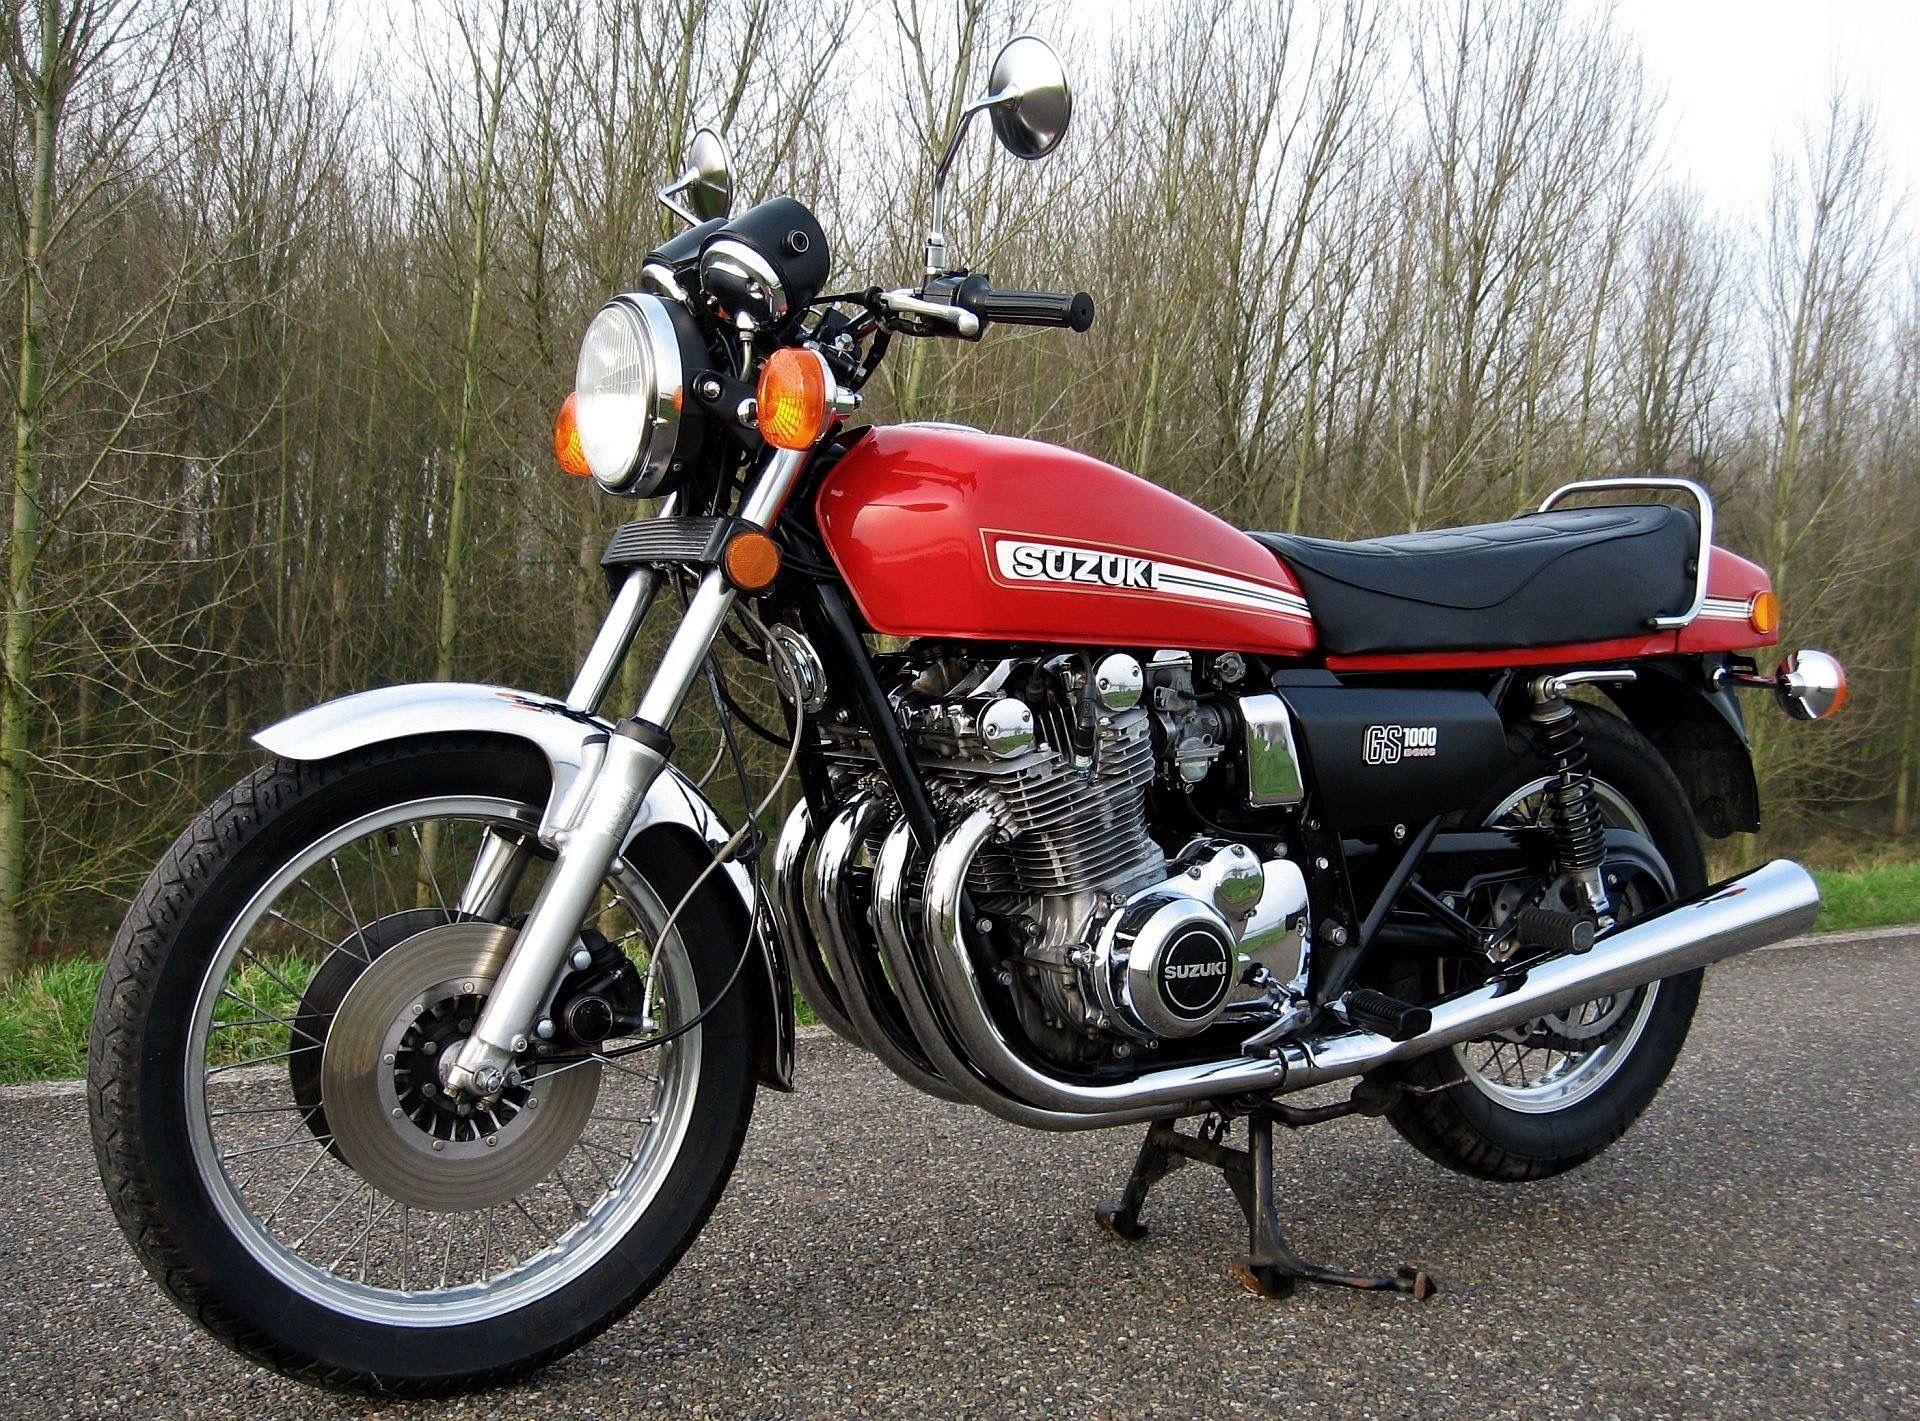 1980 Suzuki GS850 Cafe Racer Project | Cafe racer, Cafe